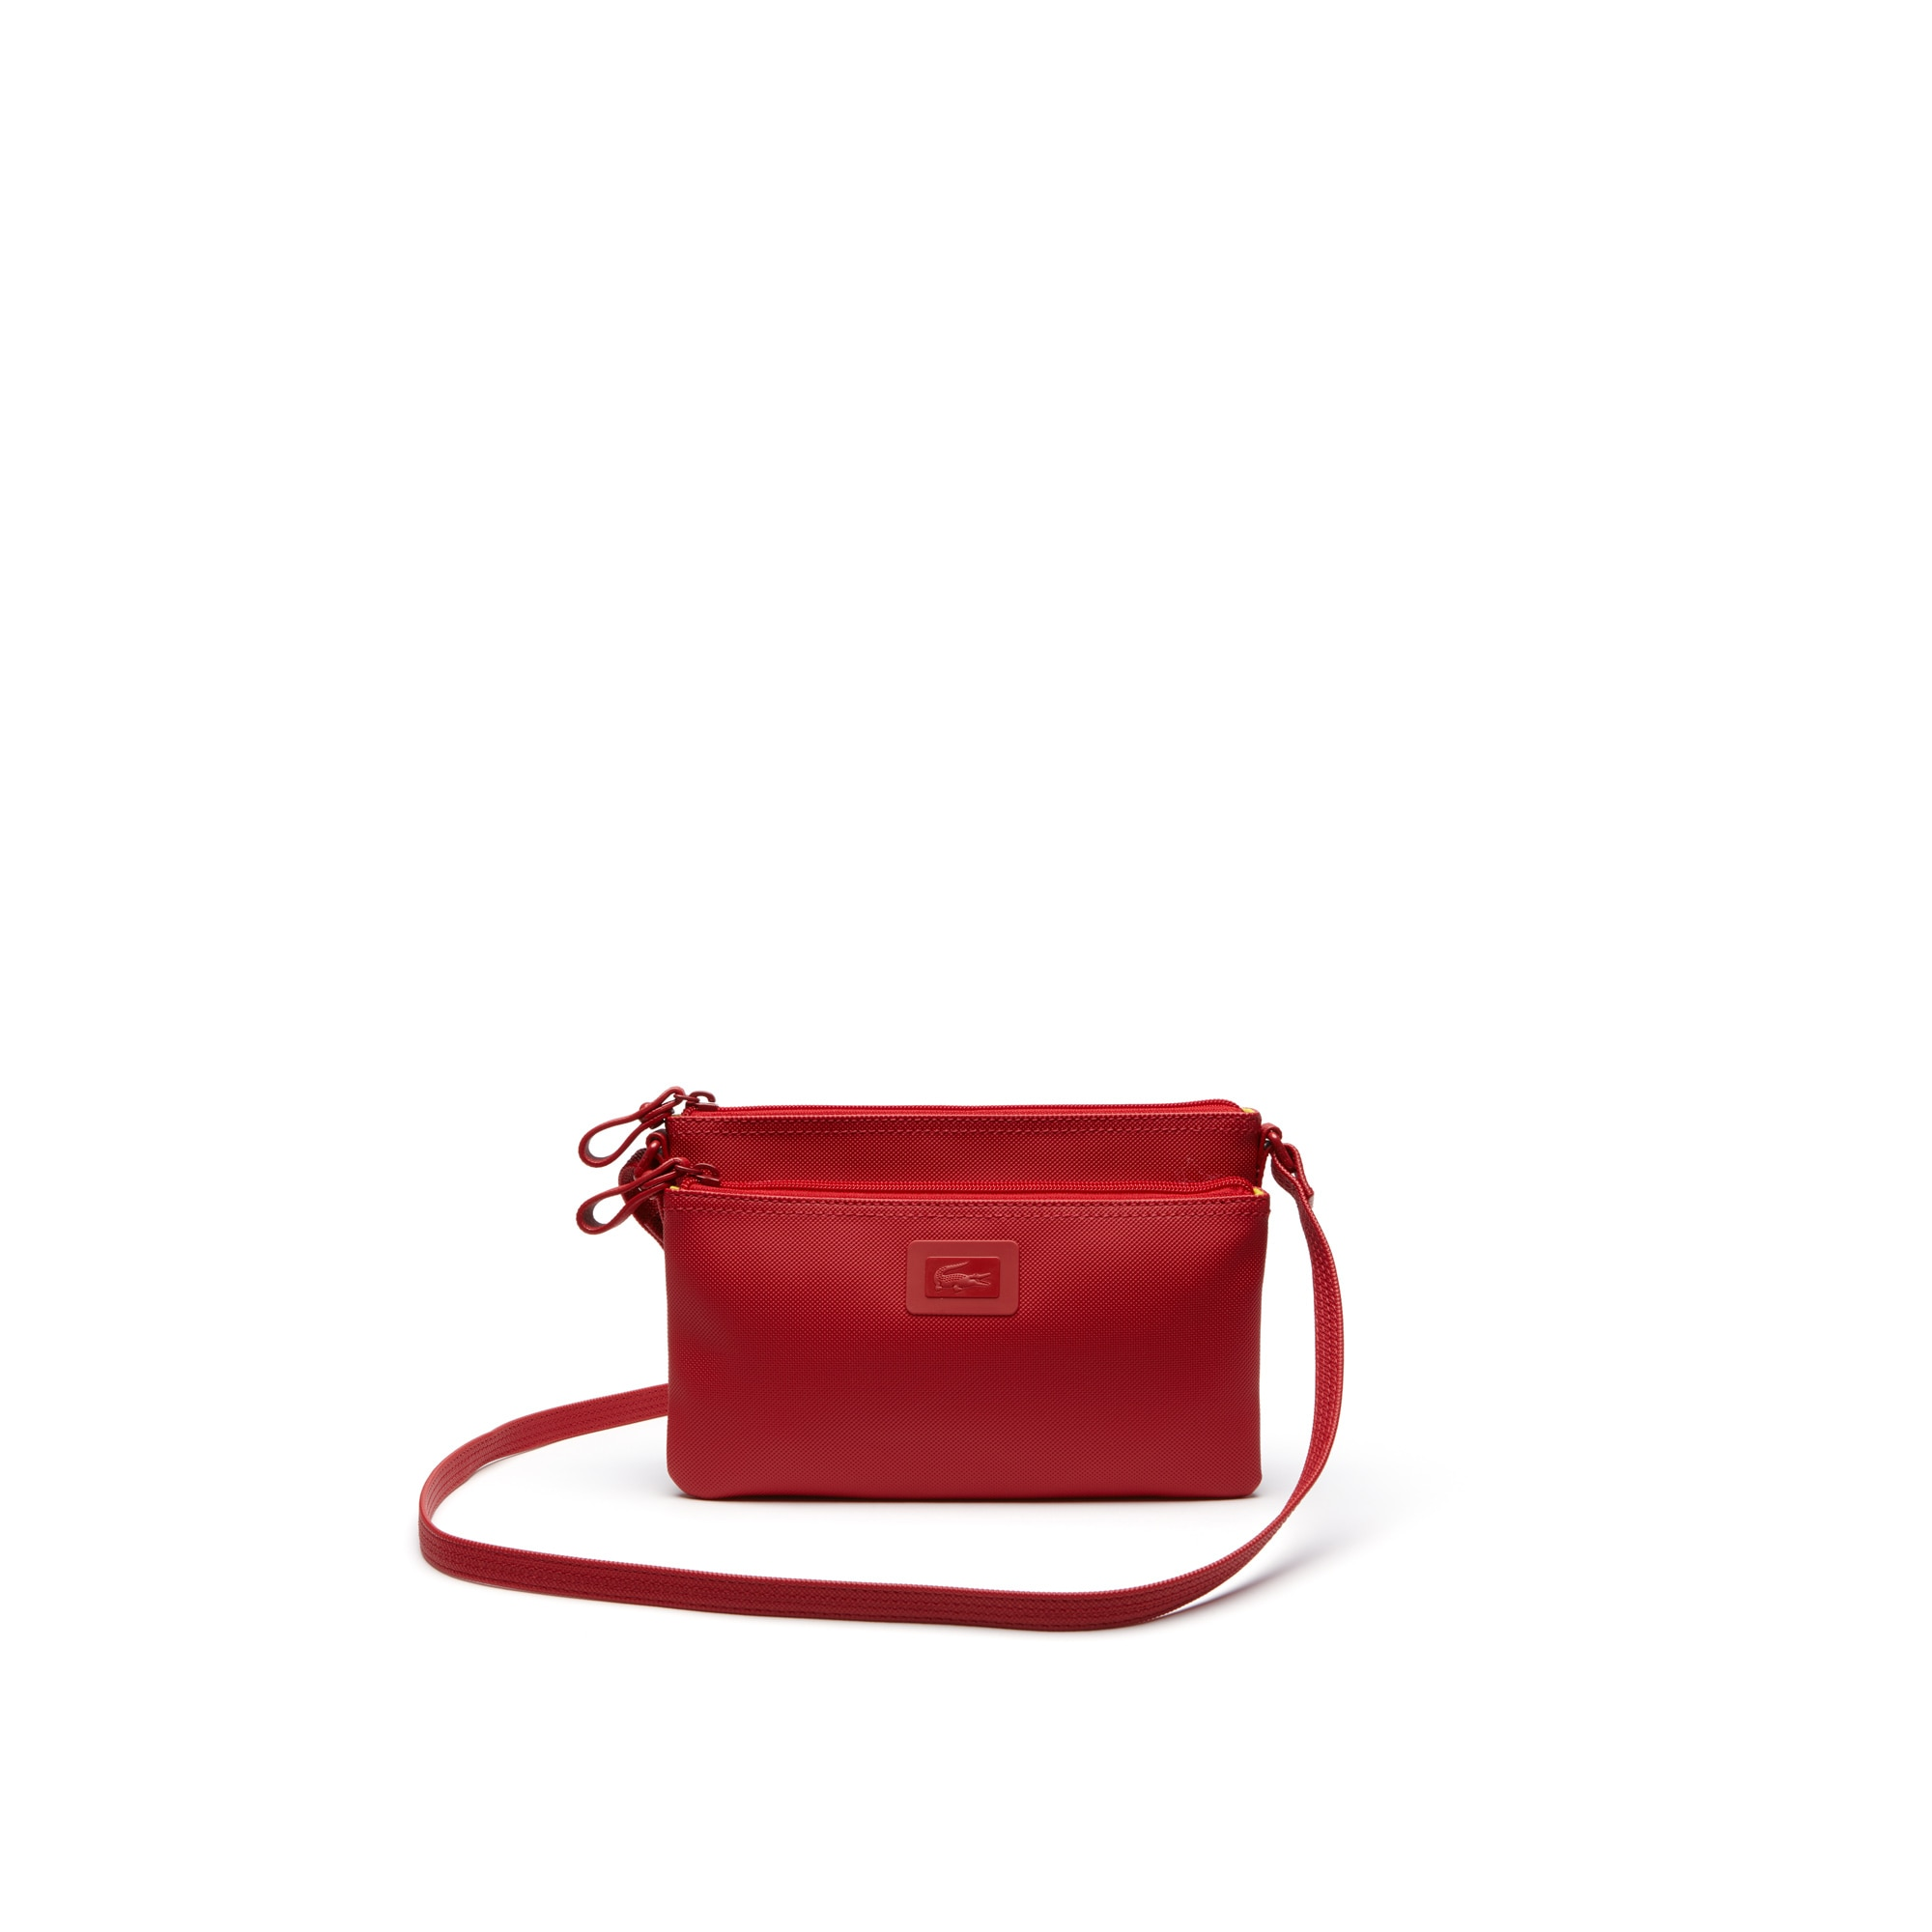 Women's Classic monochrome double zippered pouch